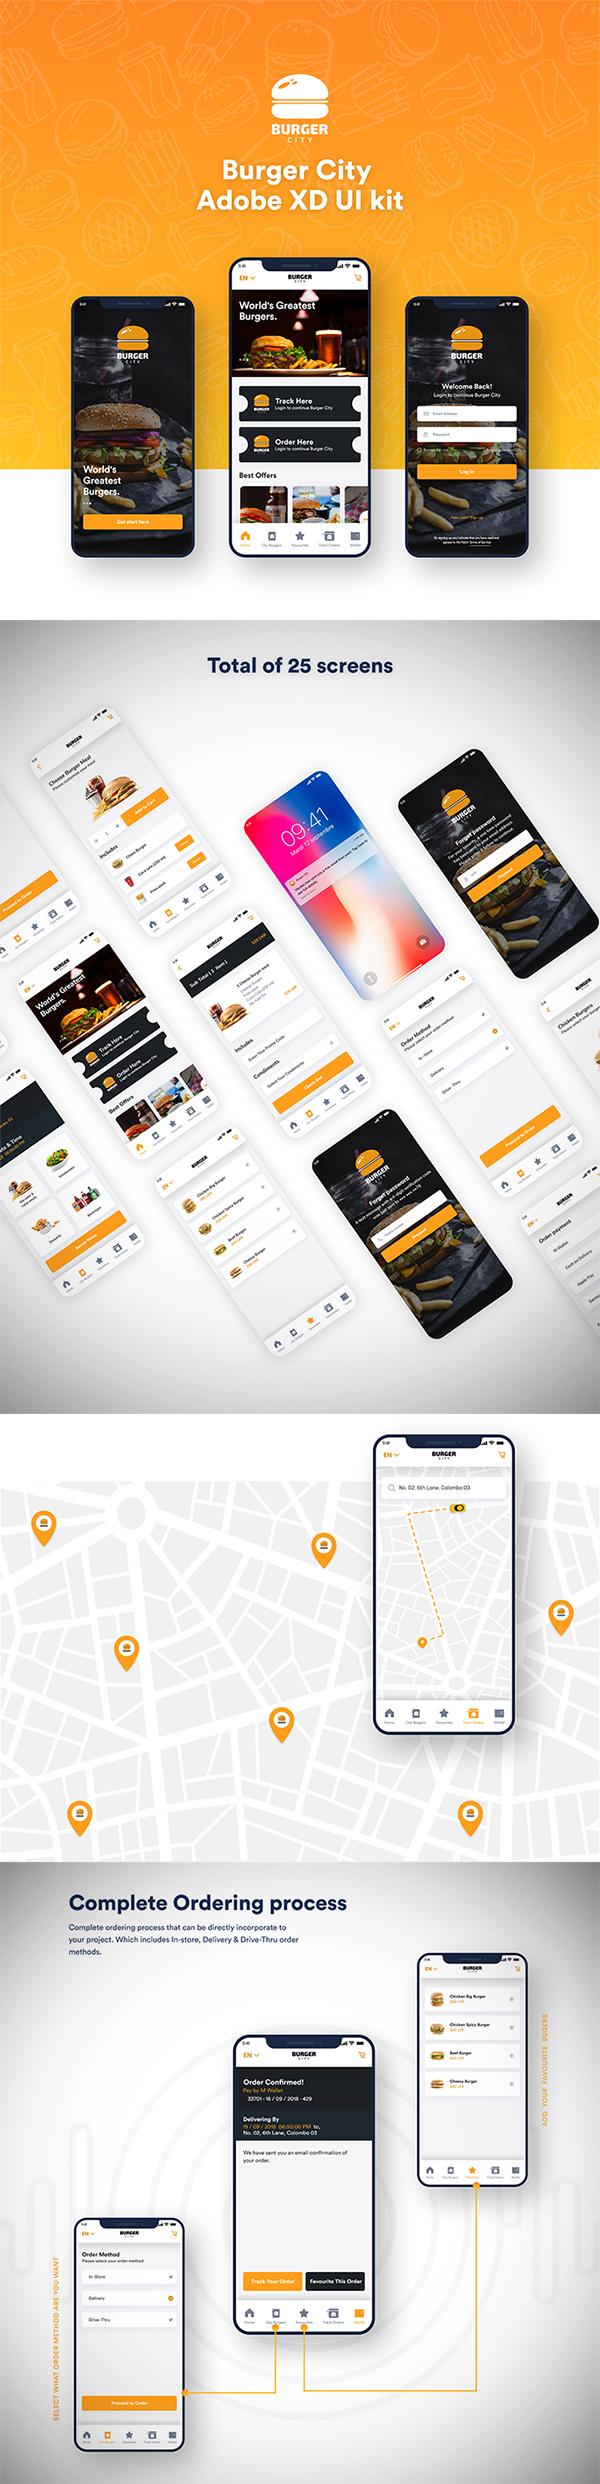 Free Download Creative Burger Store Mobile App (Adobe XD UI kit)